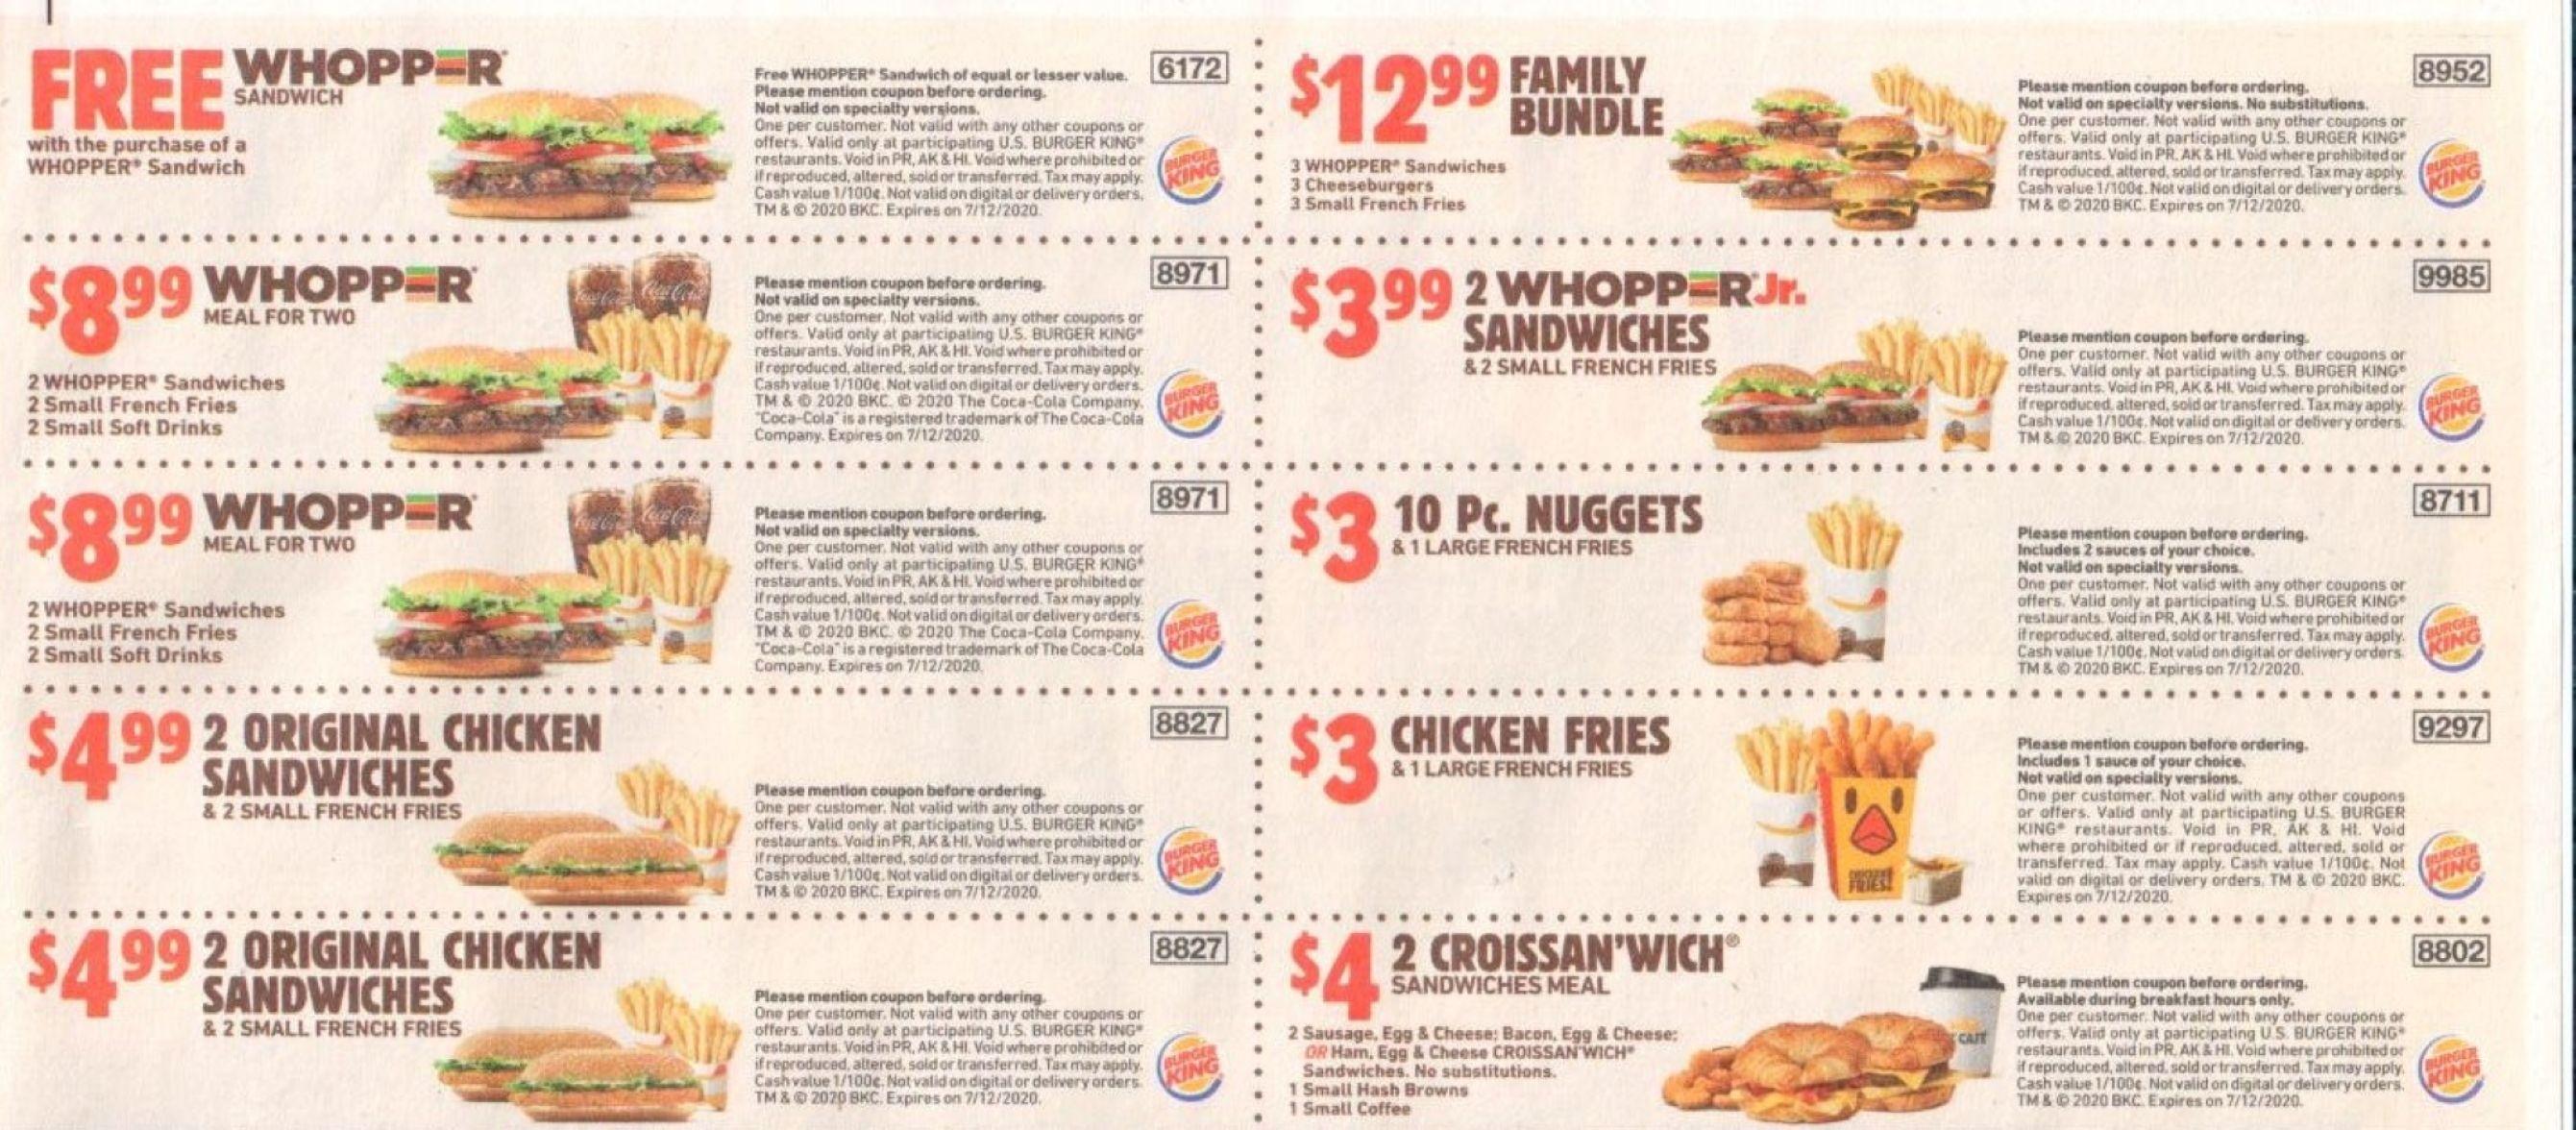 Burger King Coupons Usa May 2020 In 2020 Food Coupon Burger King Good Burger